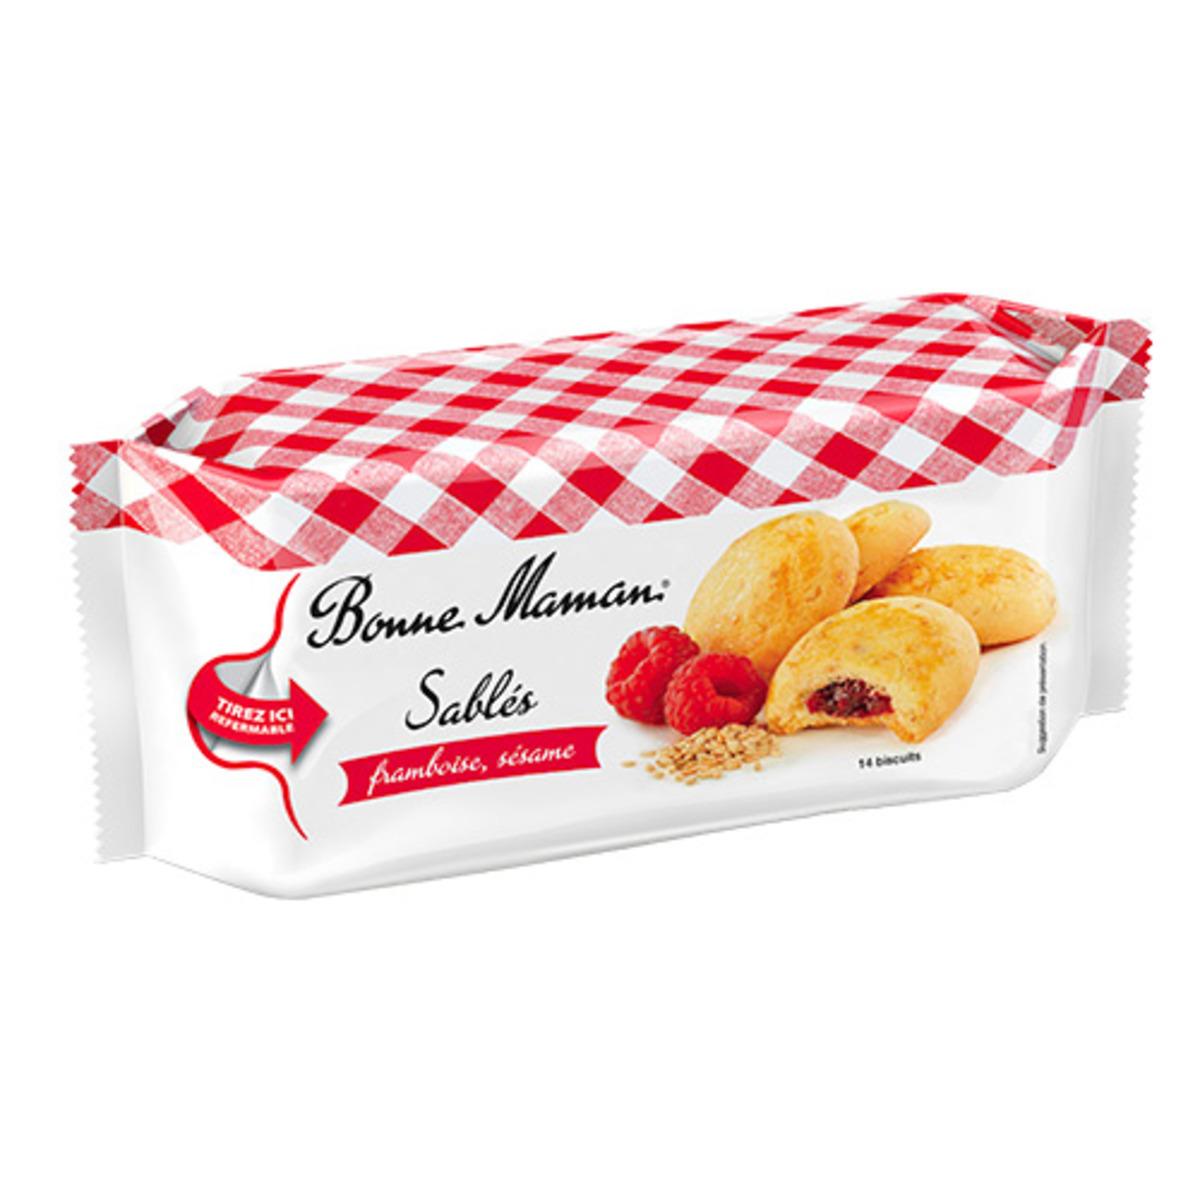 Sablés Framboise Sésame, Bonne Maman (150 g)